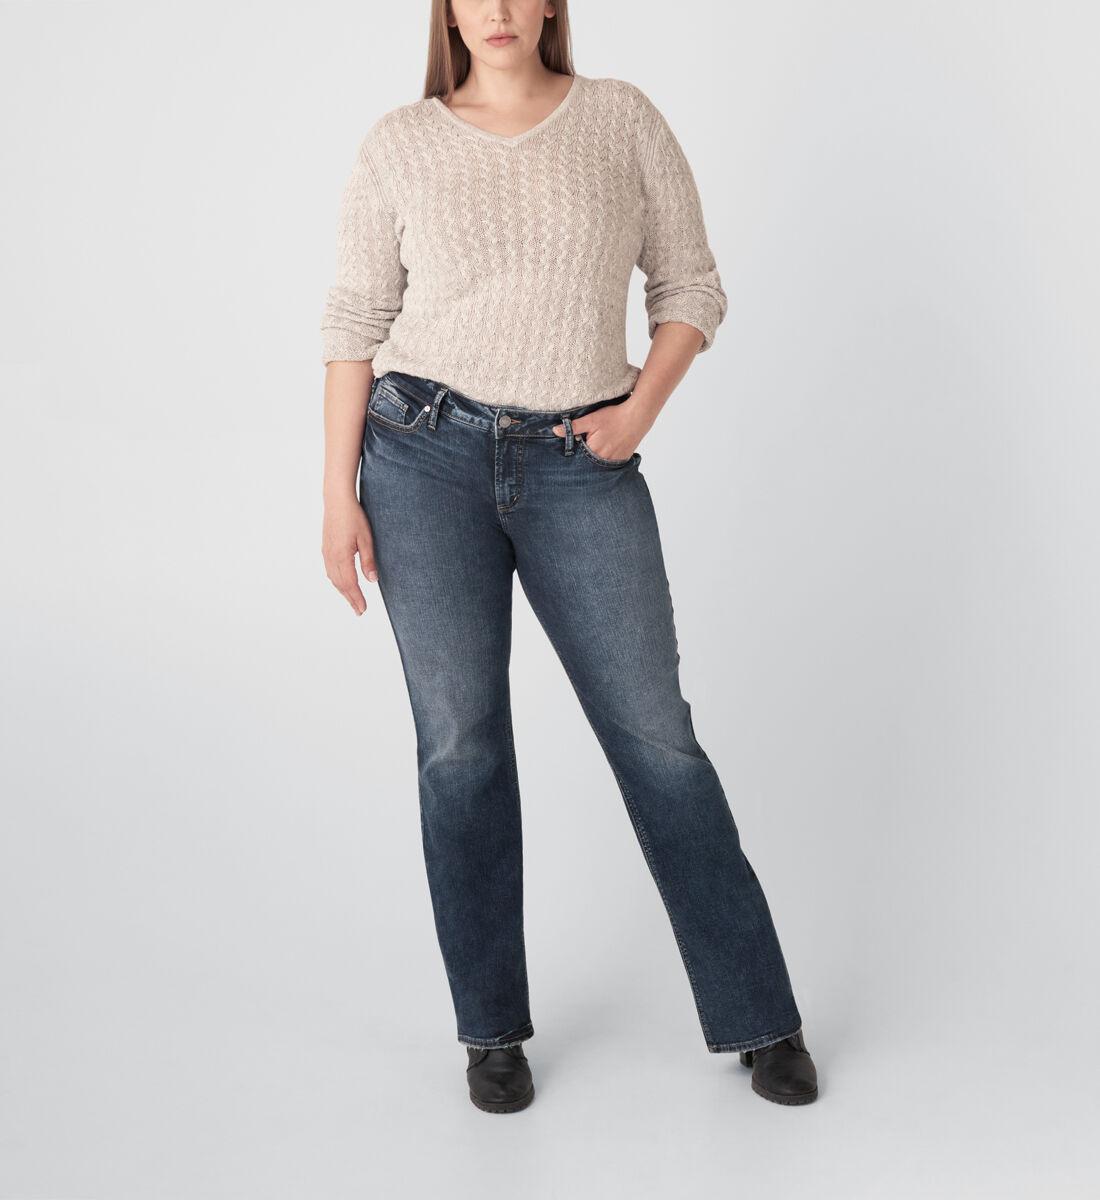 Elyse Mid Rise Slim Bootcut Jeans Plus Size Front